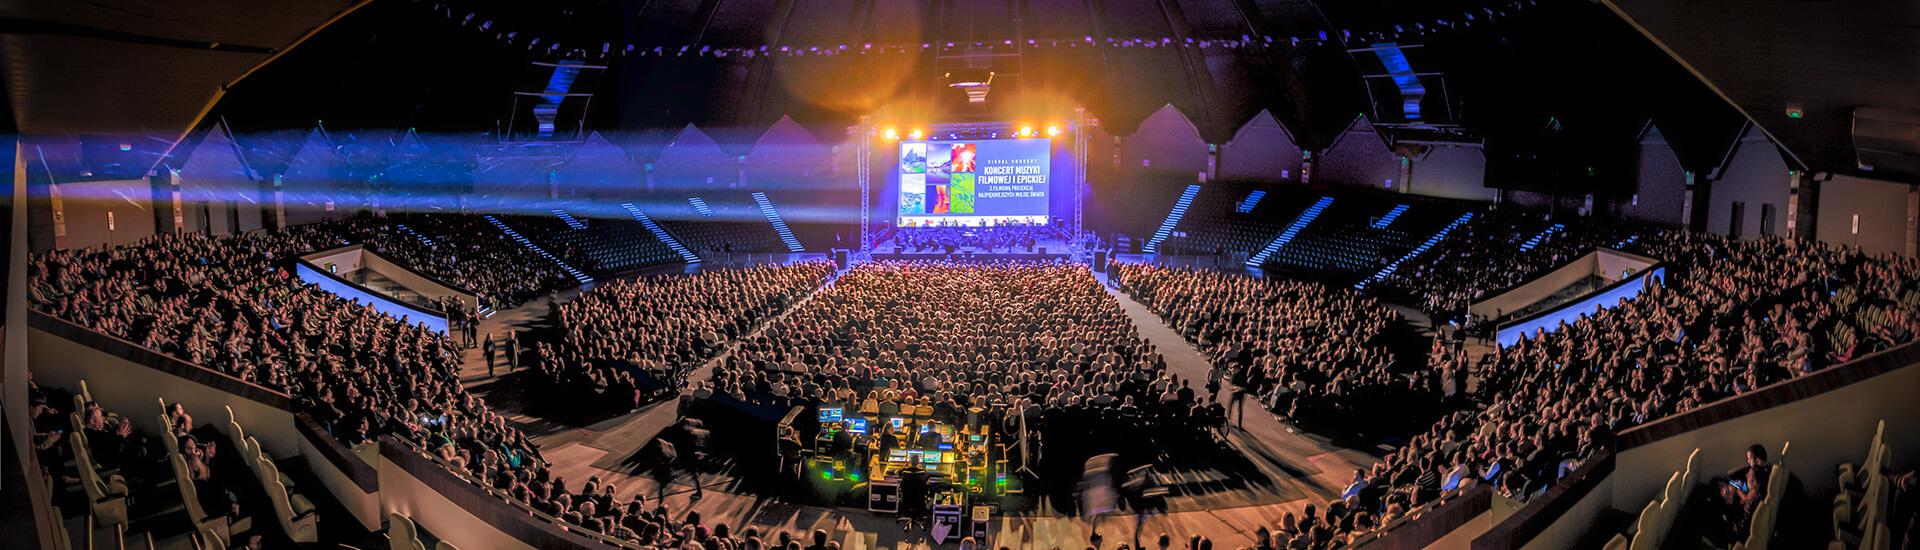 arena-pozna-visual-concert